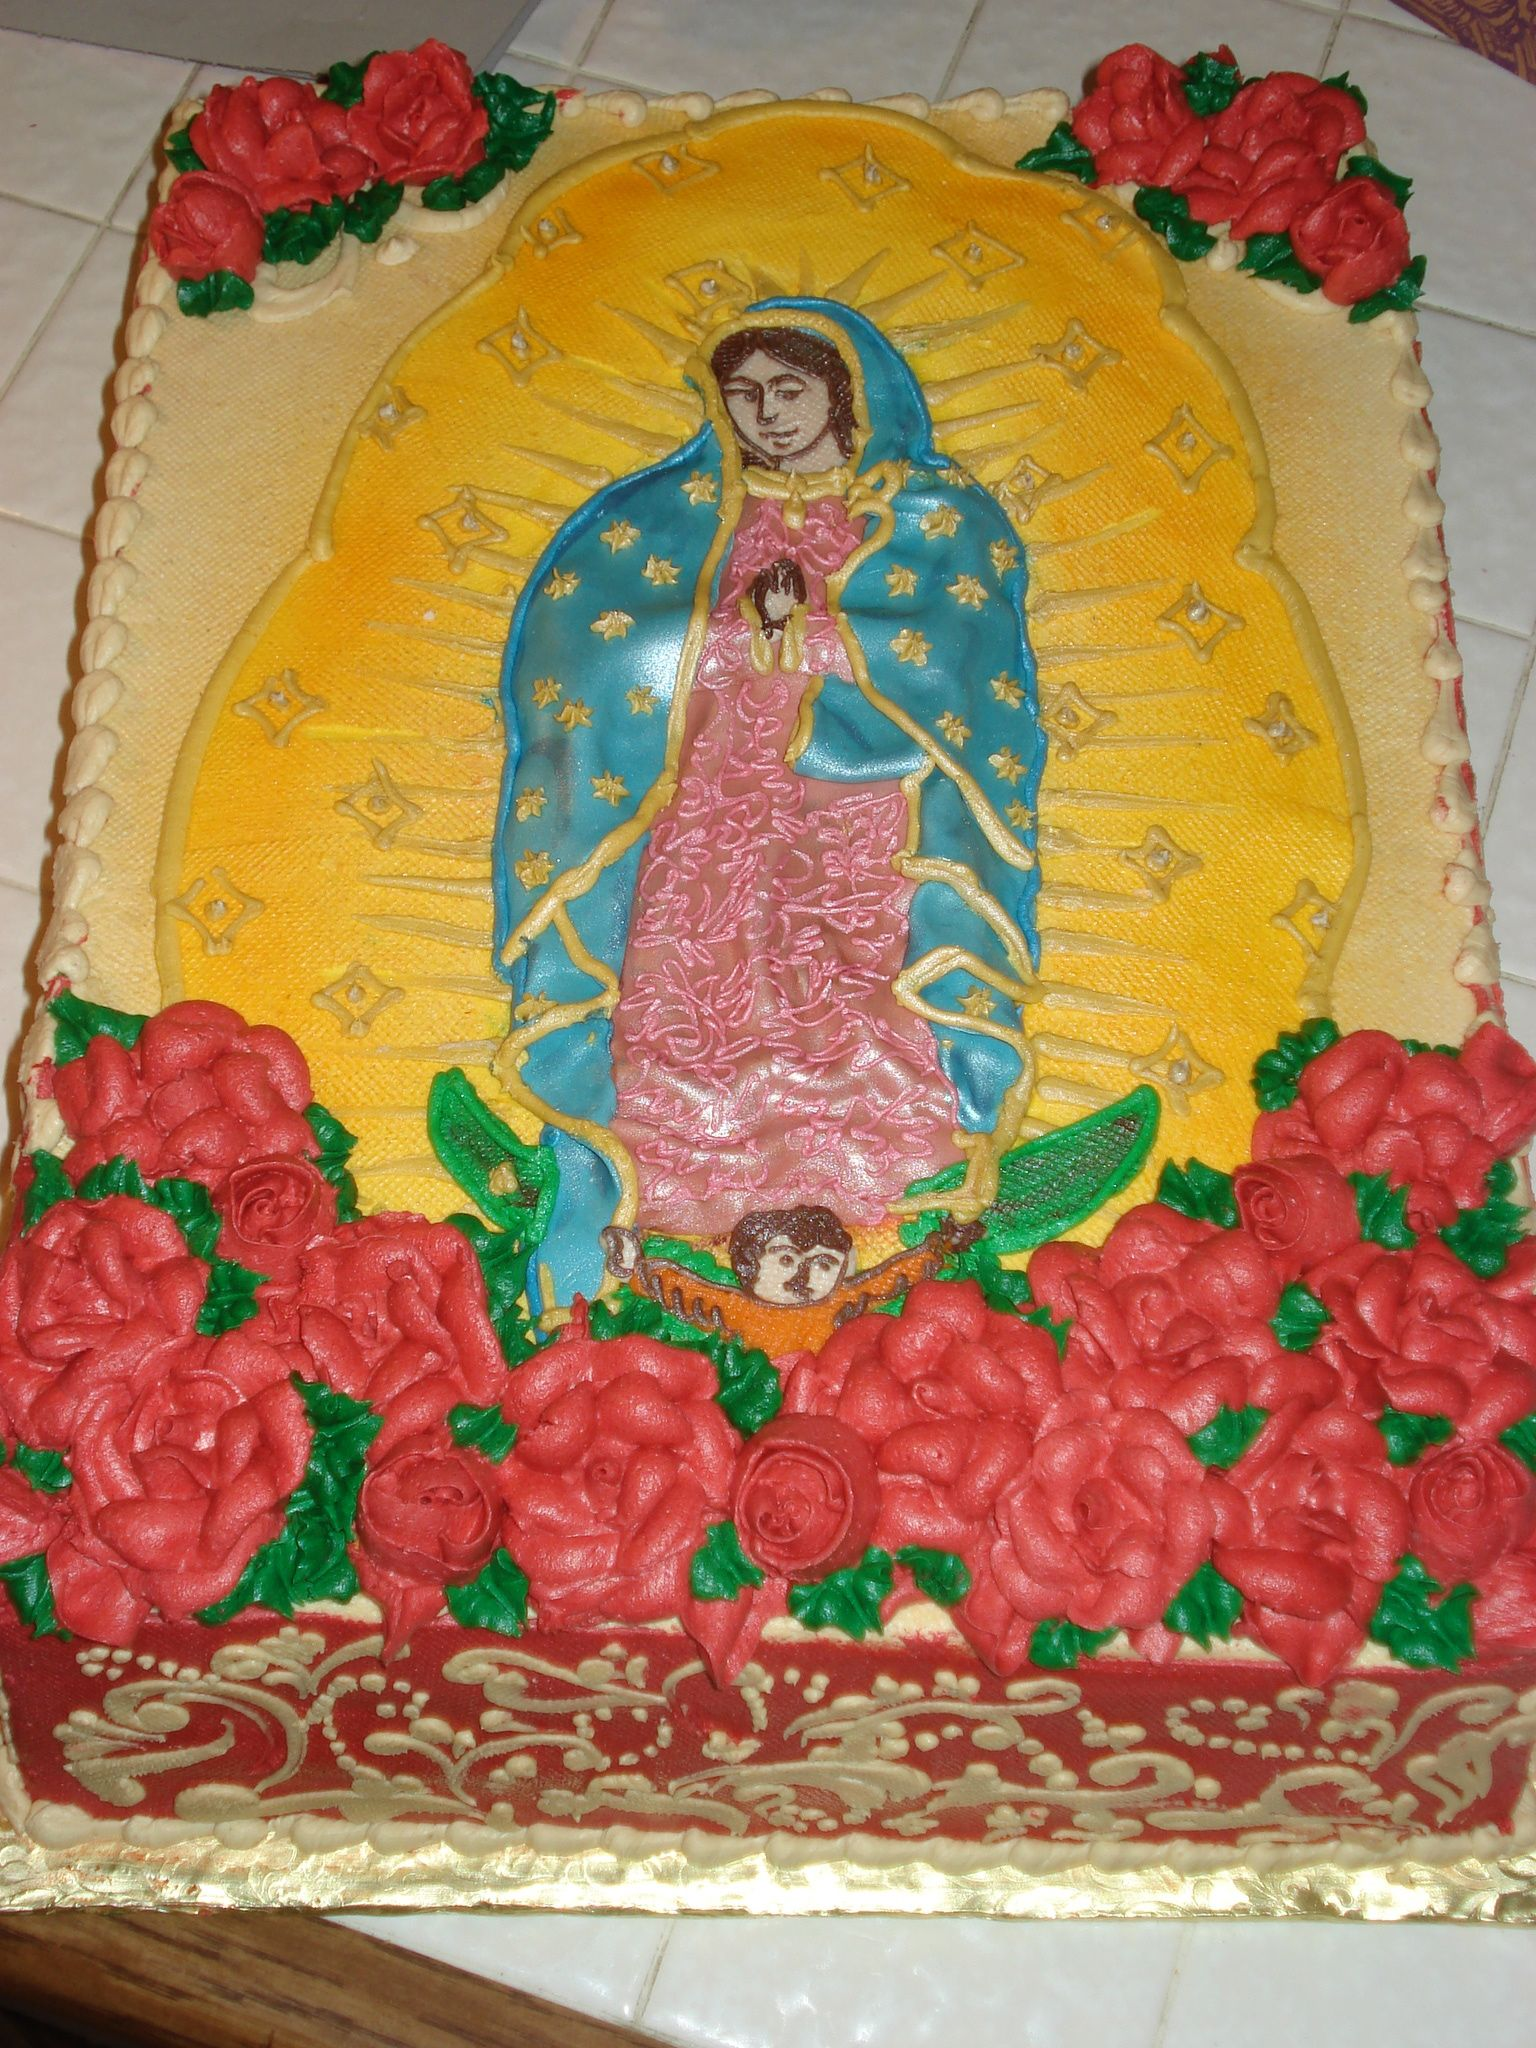 The Virgin Of Guadelupevirgin Mary Cakehappy Birthday